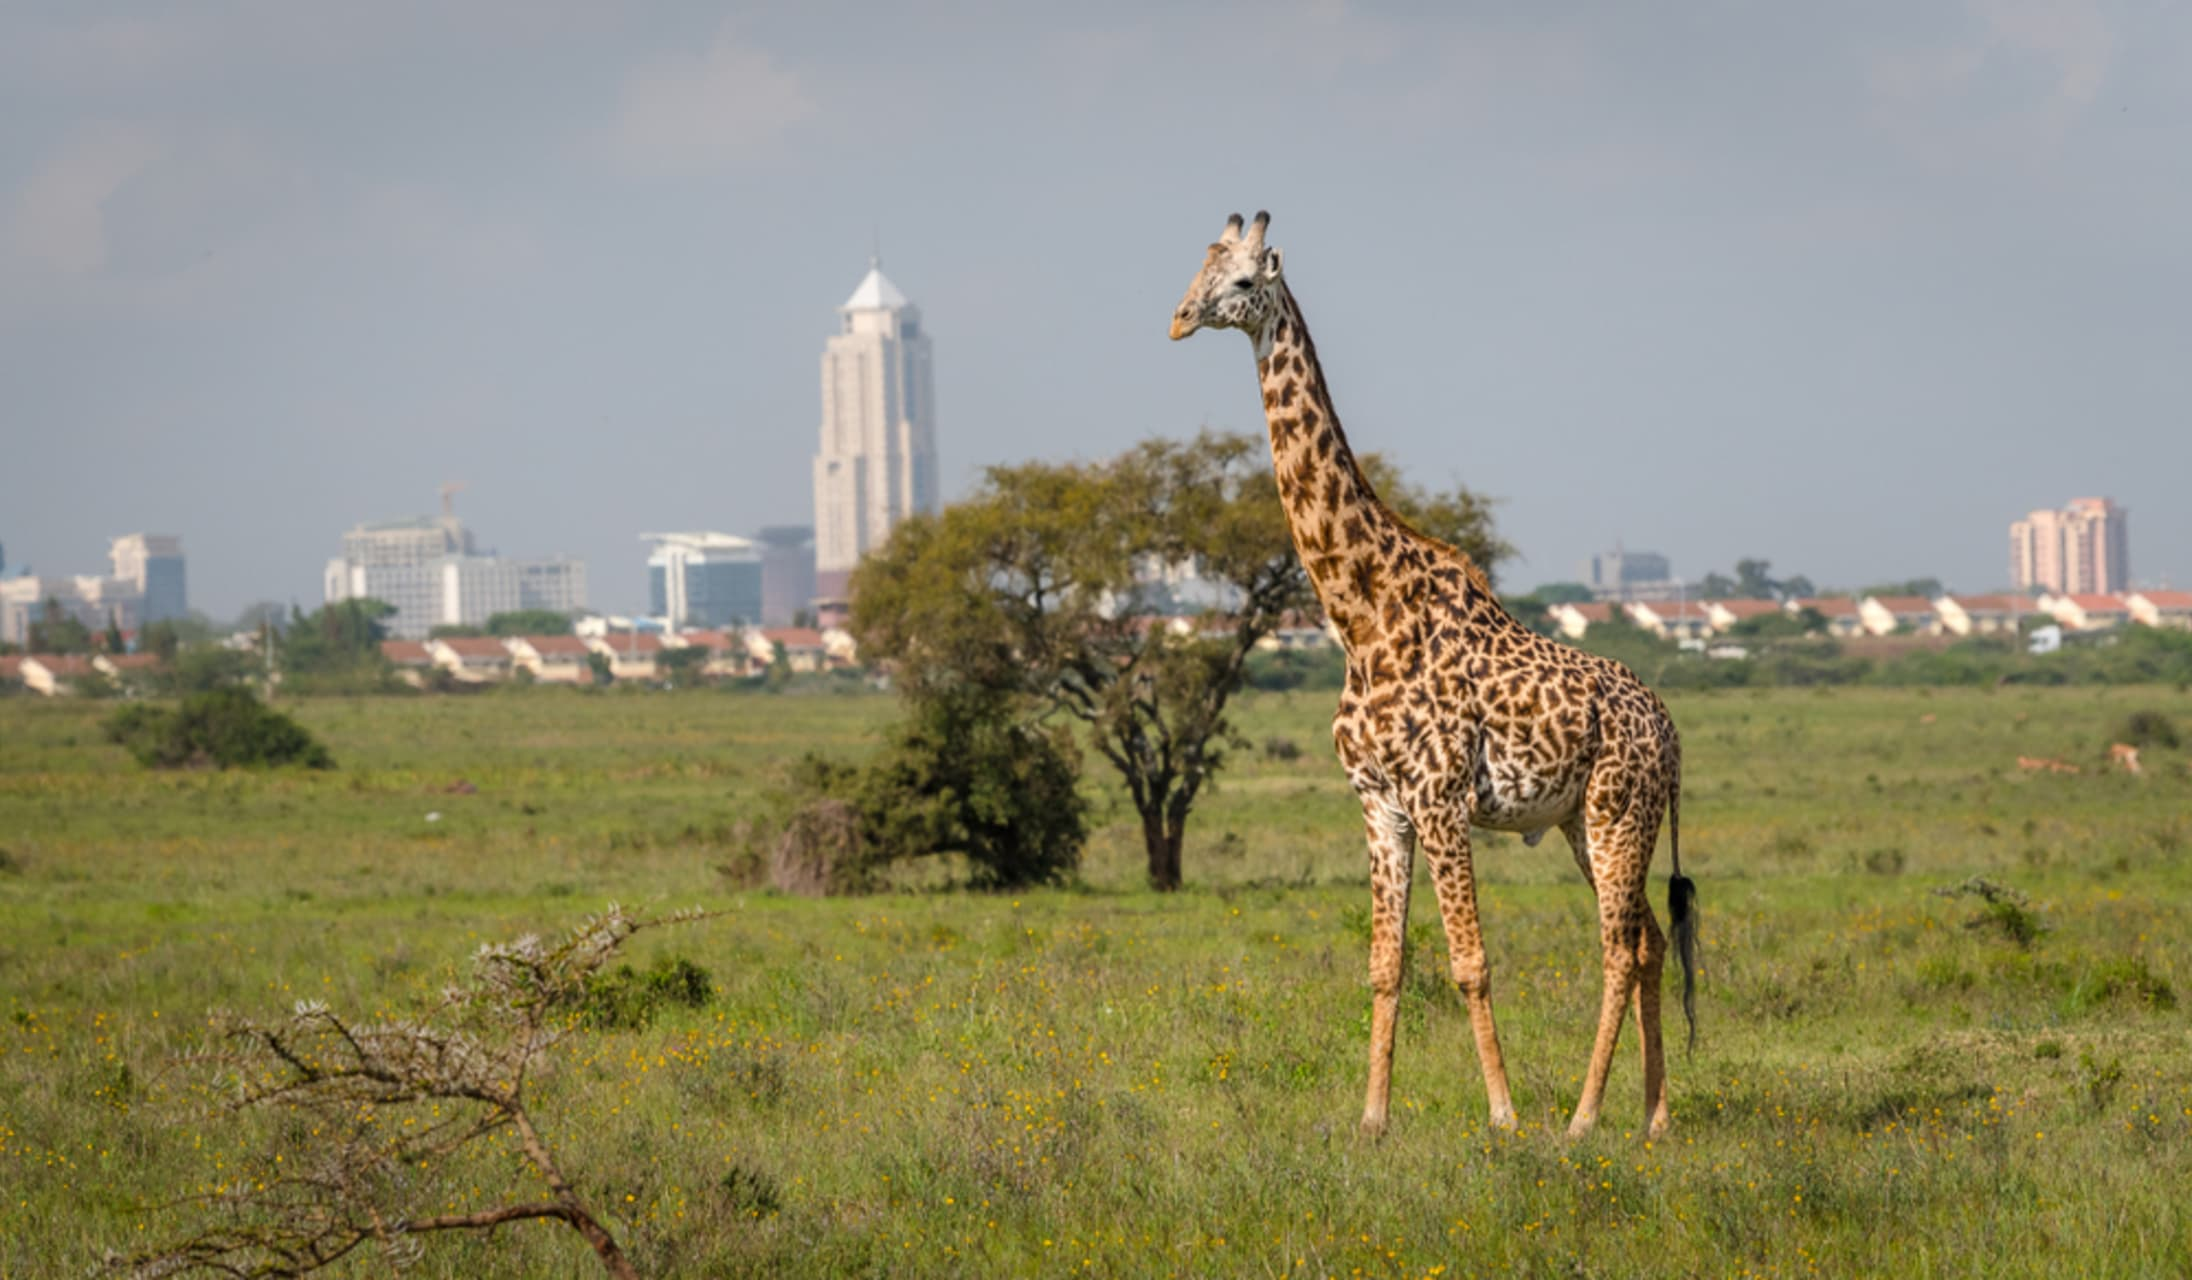 Nairobi - Sundowner and safari in the only national park within a city - Nairobi National Park